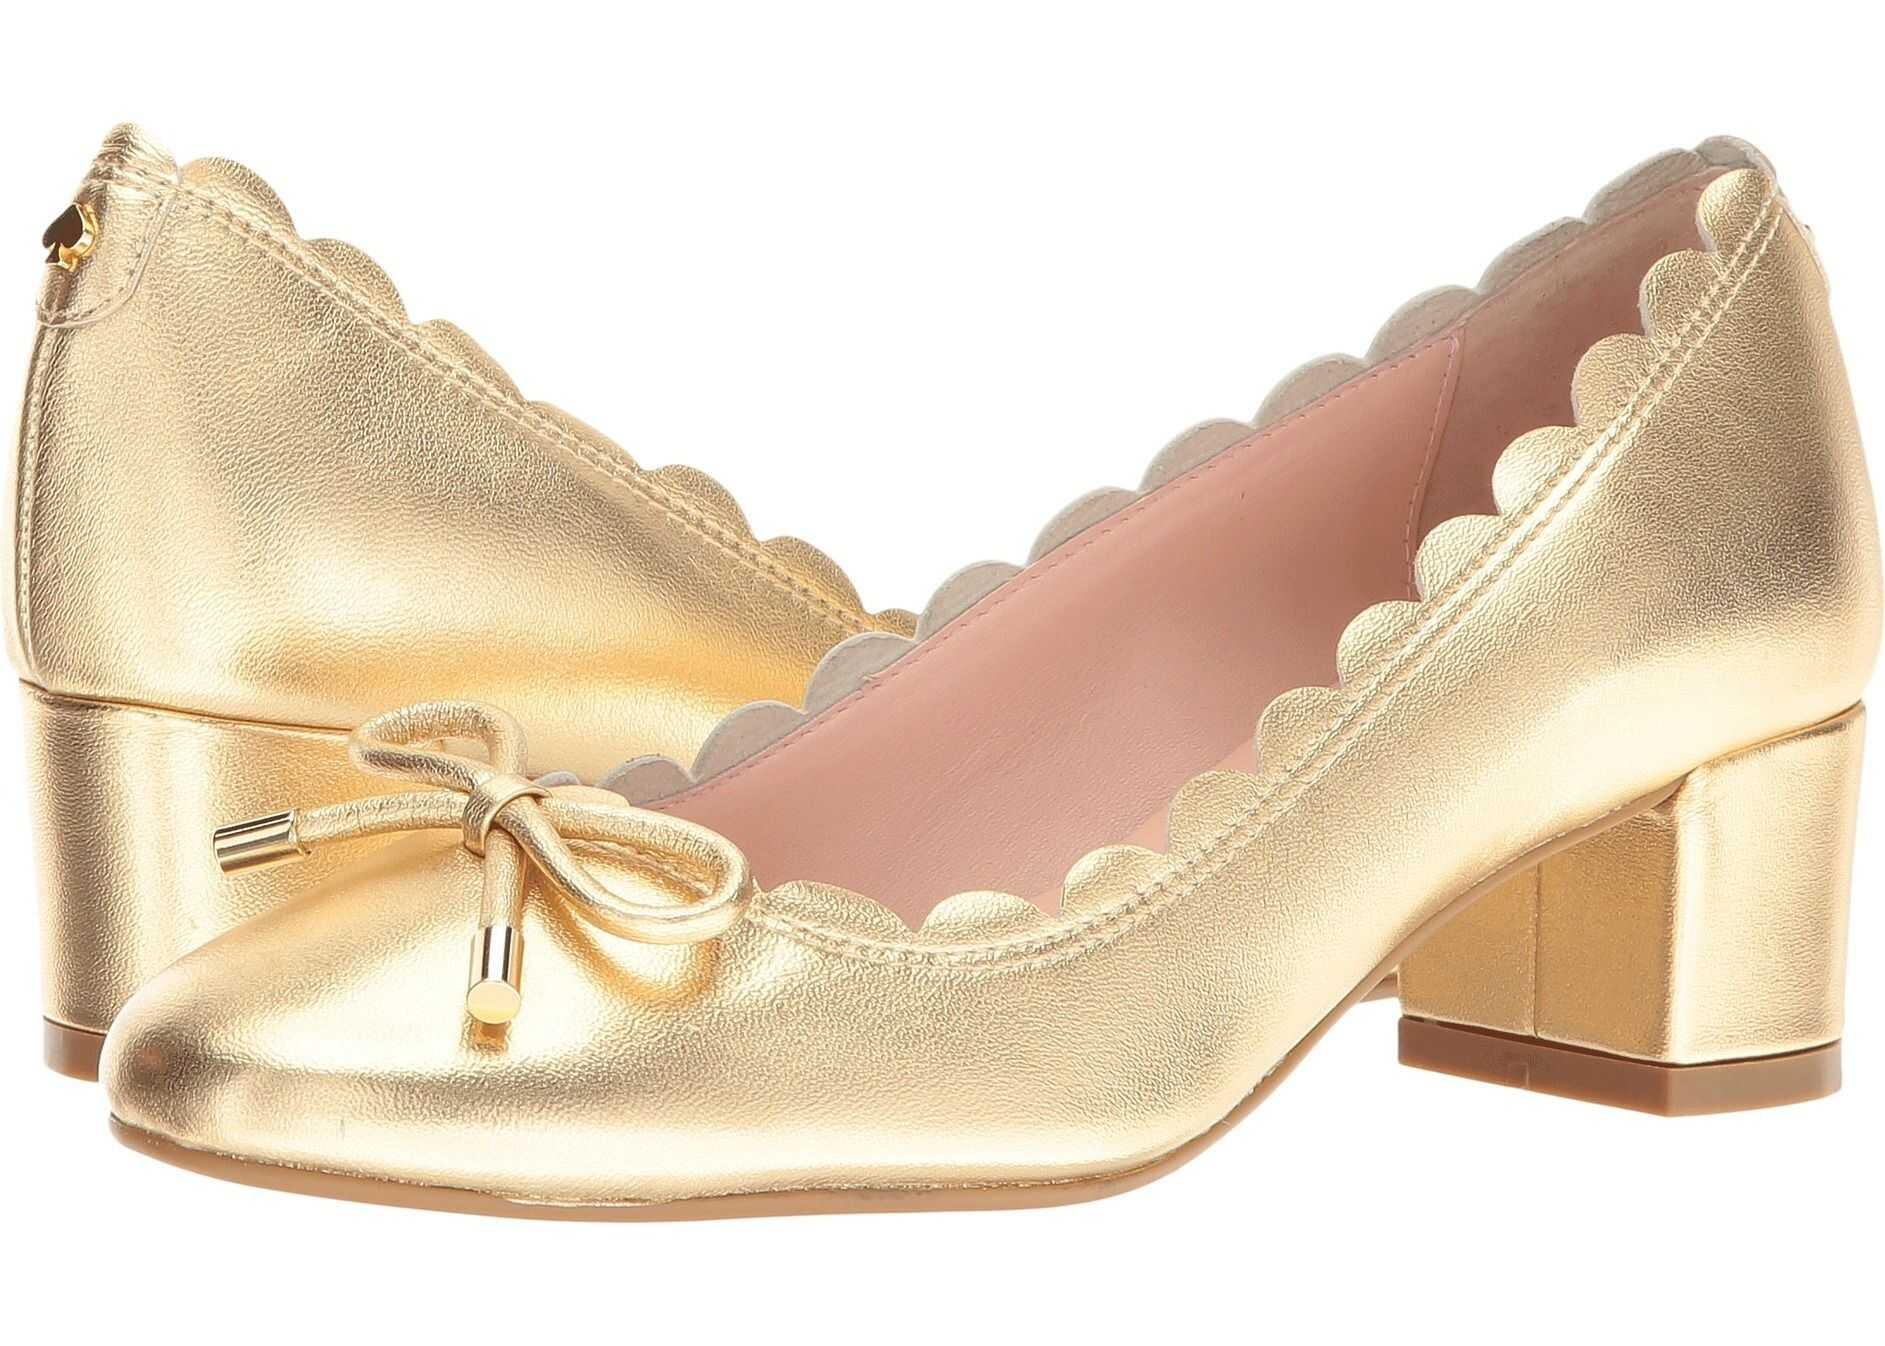 Kate Spade New York Yasmin* Gold Metallic Nappa